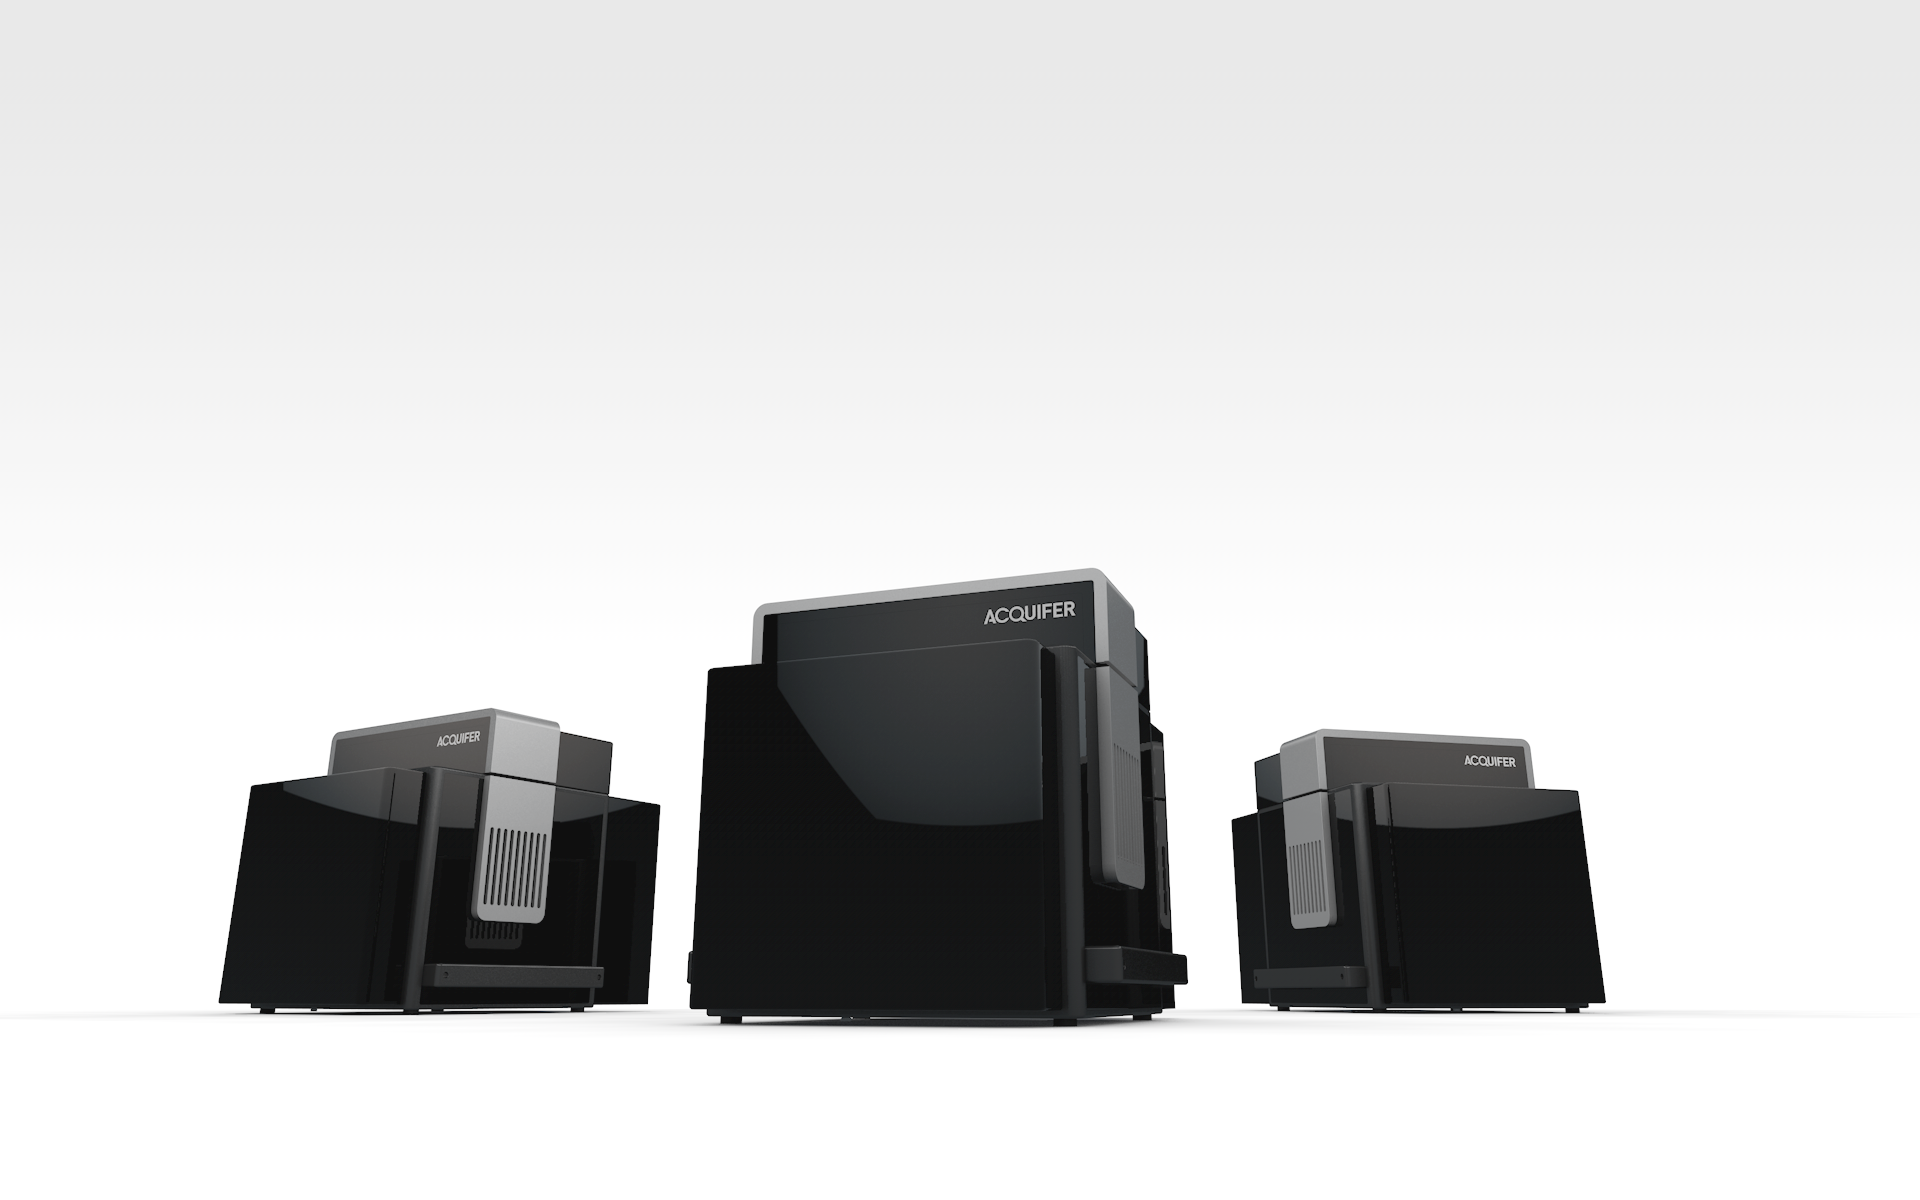 Acquifer HCS Imaging Machine Group